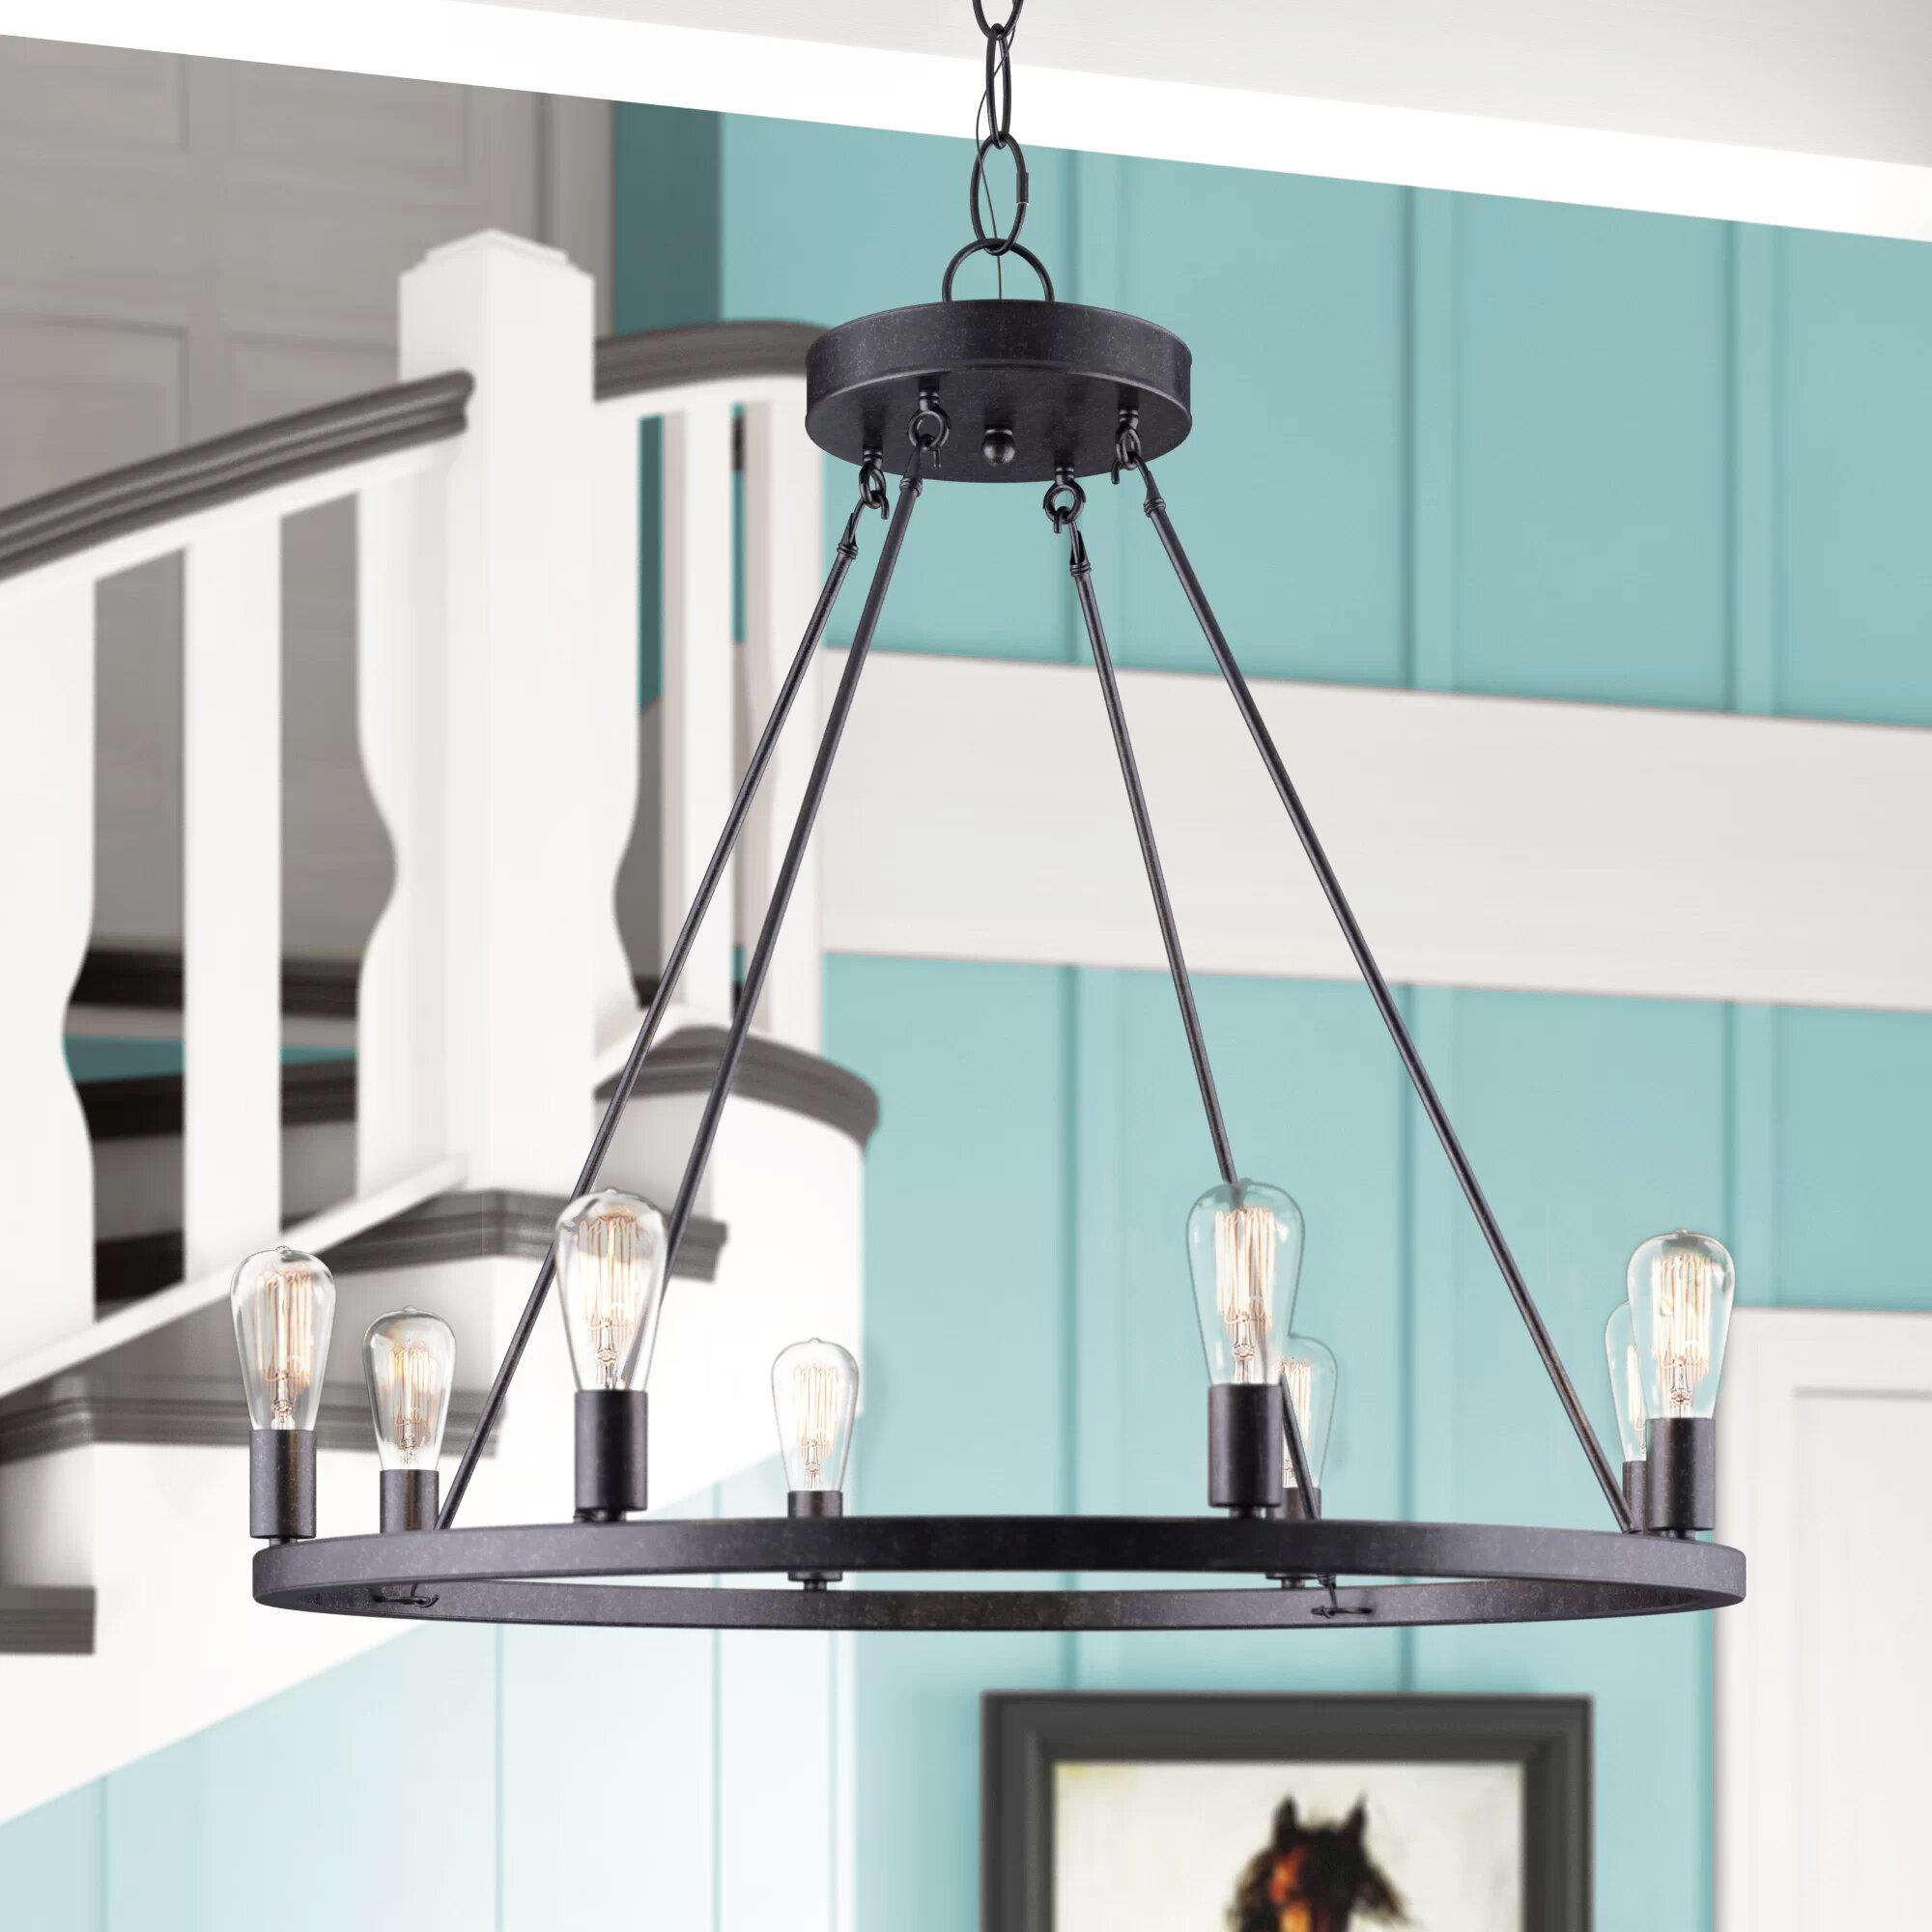 Gracie Oaks Charndon 8 Light Candle Style Wagon Wheel Chandelier Reviews Wayfair